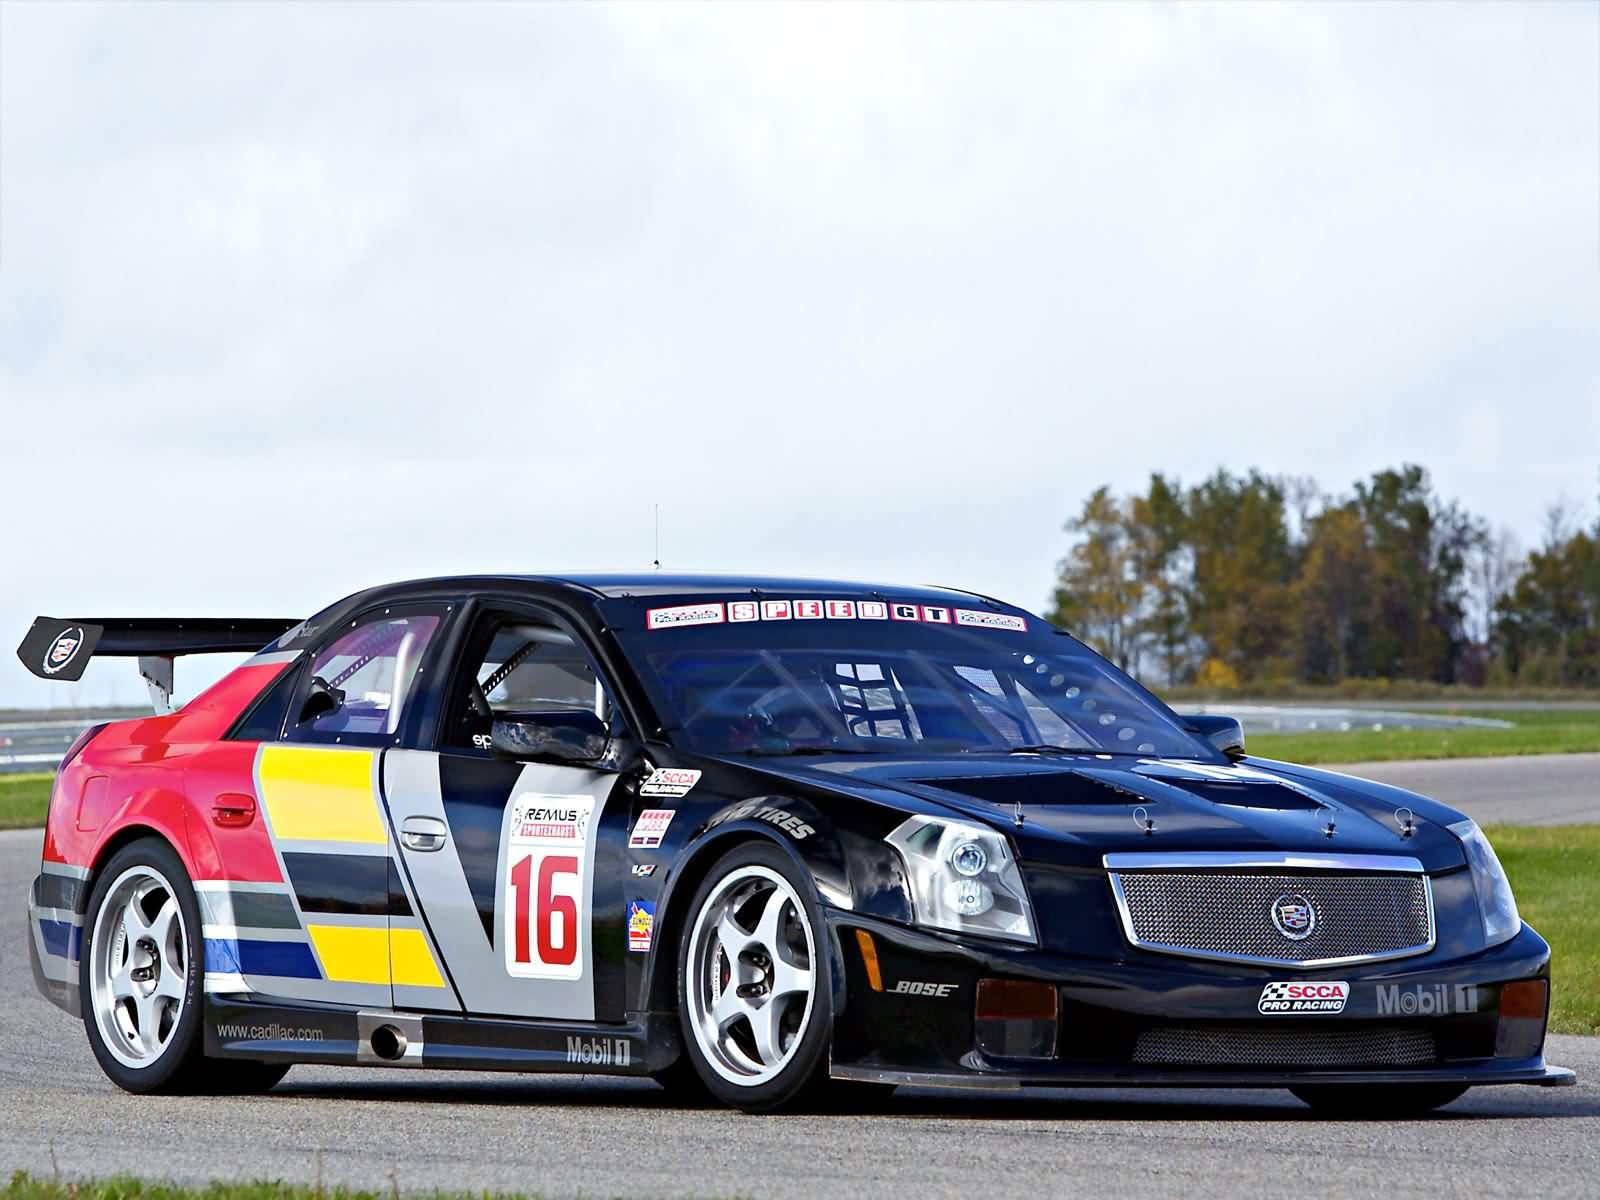 Cadillac Cts V Race Car Mp Pic